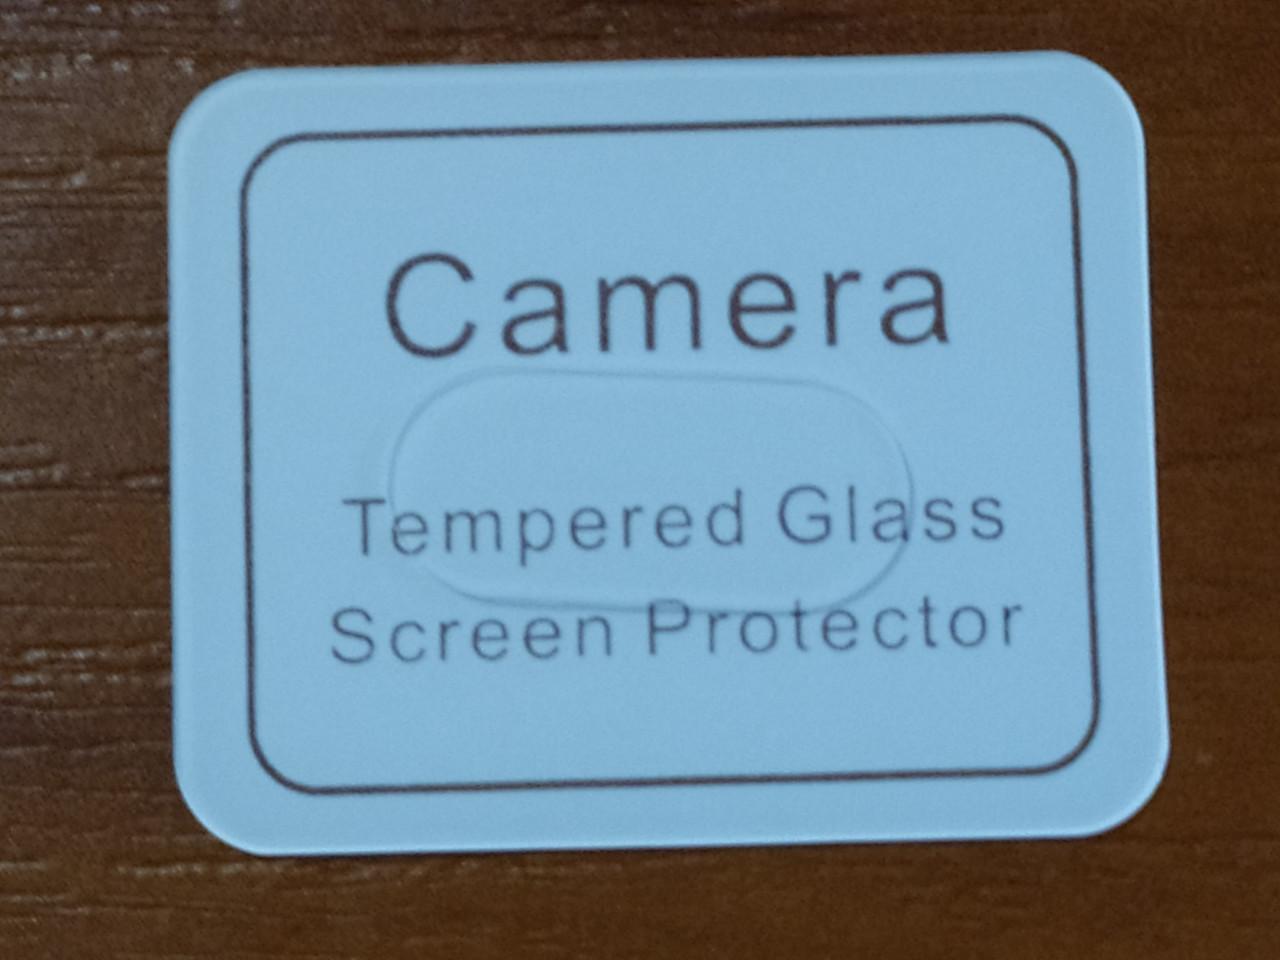 Защитное стекло на камеру Tempered Glass Screen Protector  Xiaomi Redmi 8 / Redmi 8A